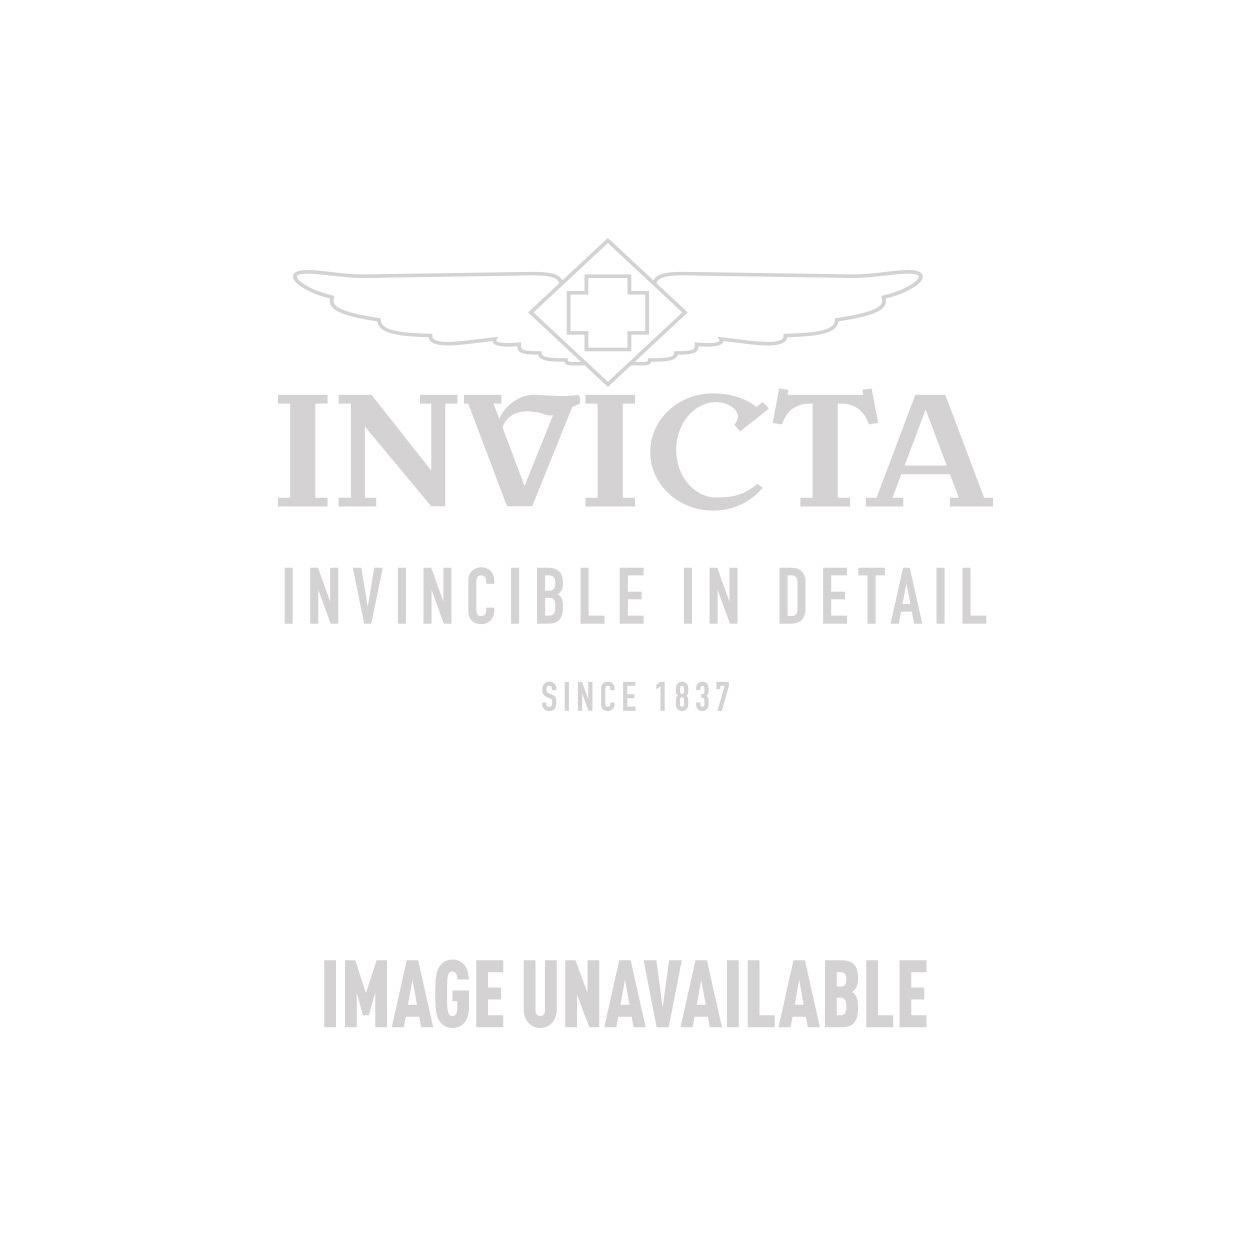 Invicta Corduba Quartz Watch - Black, Gunmetal case with Orange tone Leather band - Model 18933